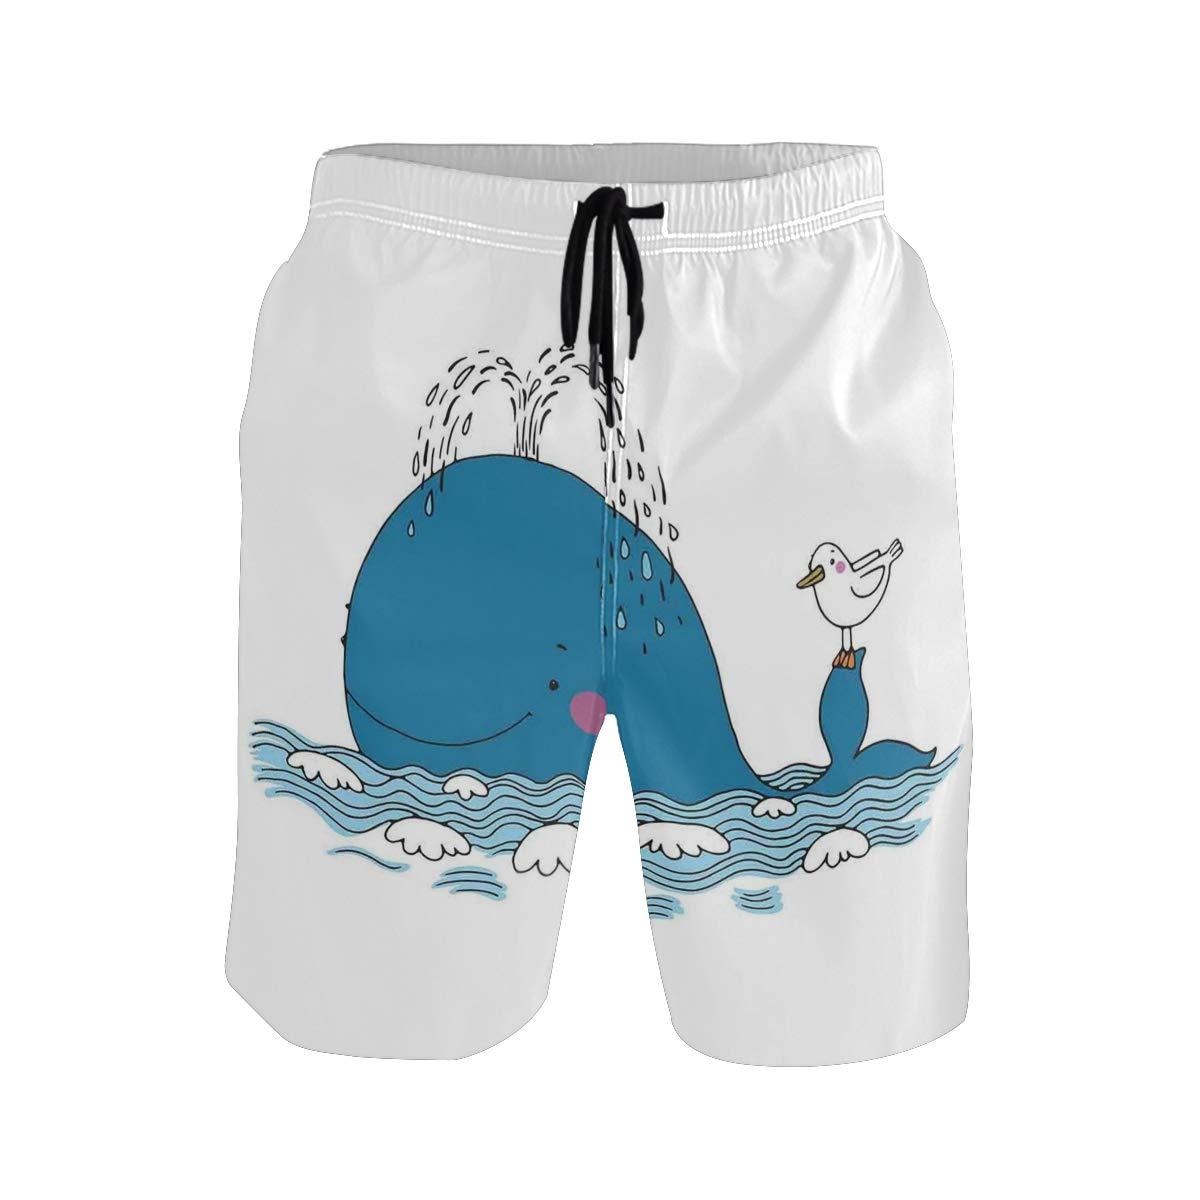 COVASA Mens Summer ShortsSea Mammal Caricature Swimming The Ocean and Splashin